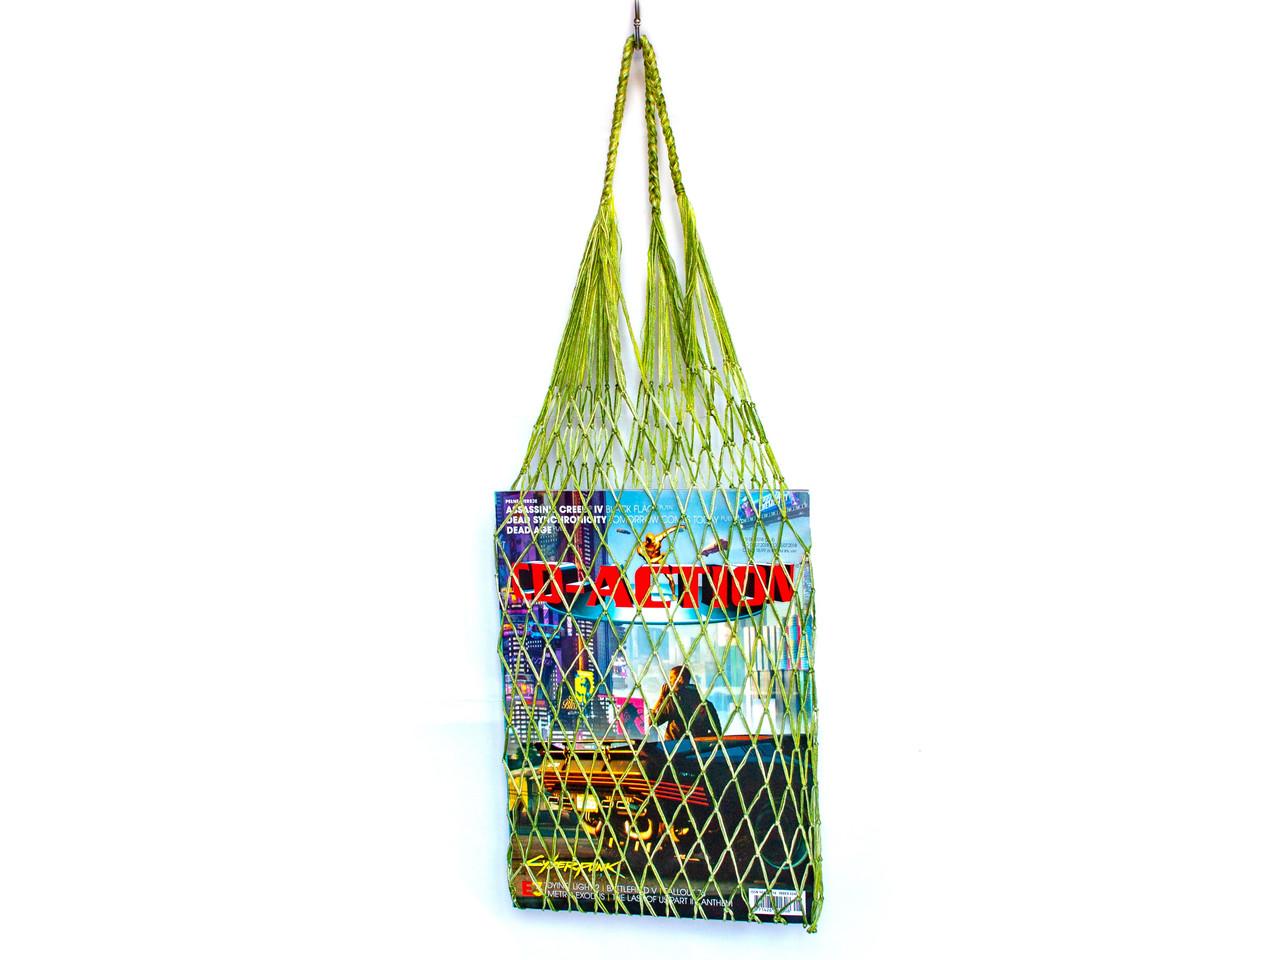 Ежедневная шопер сумка Авоська -  Французская сумка - Молодая зелень